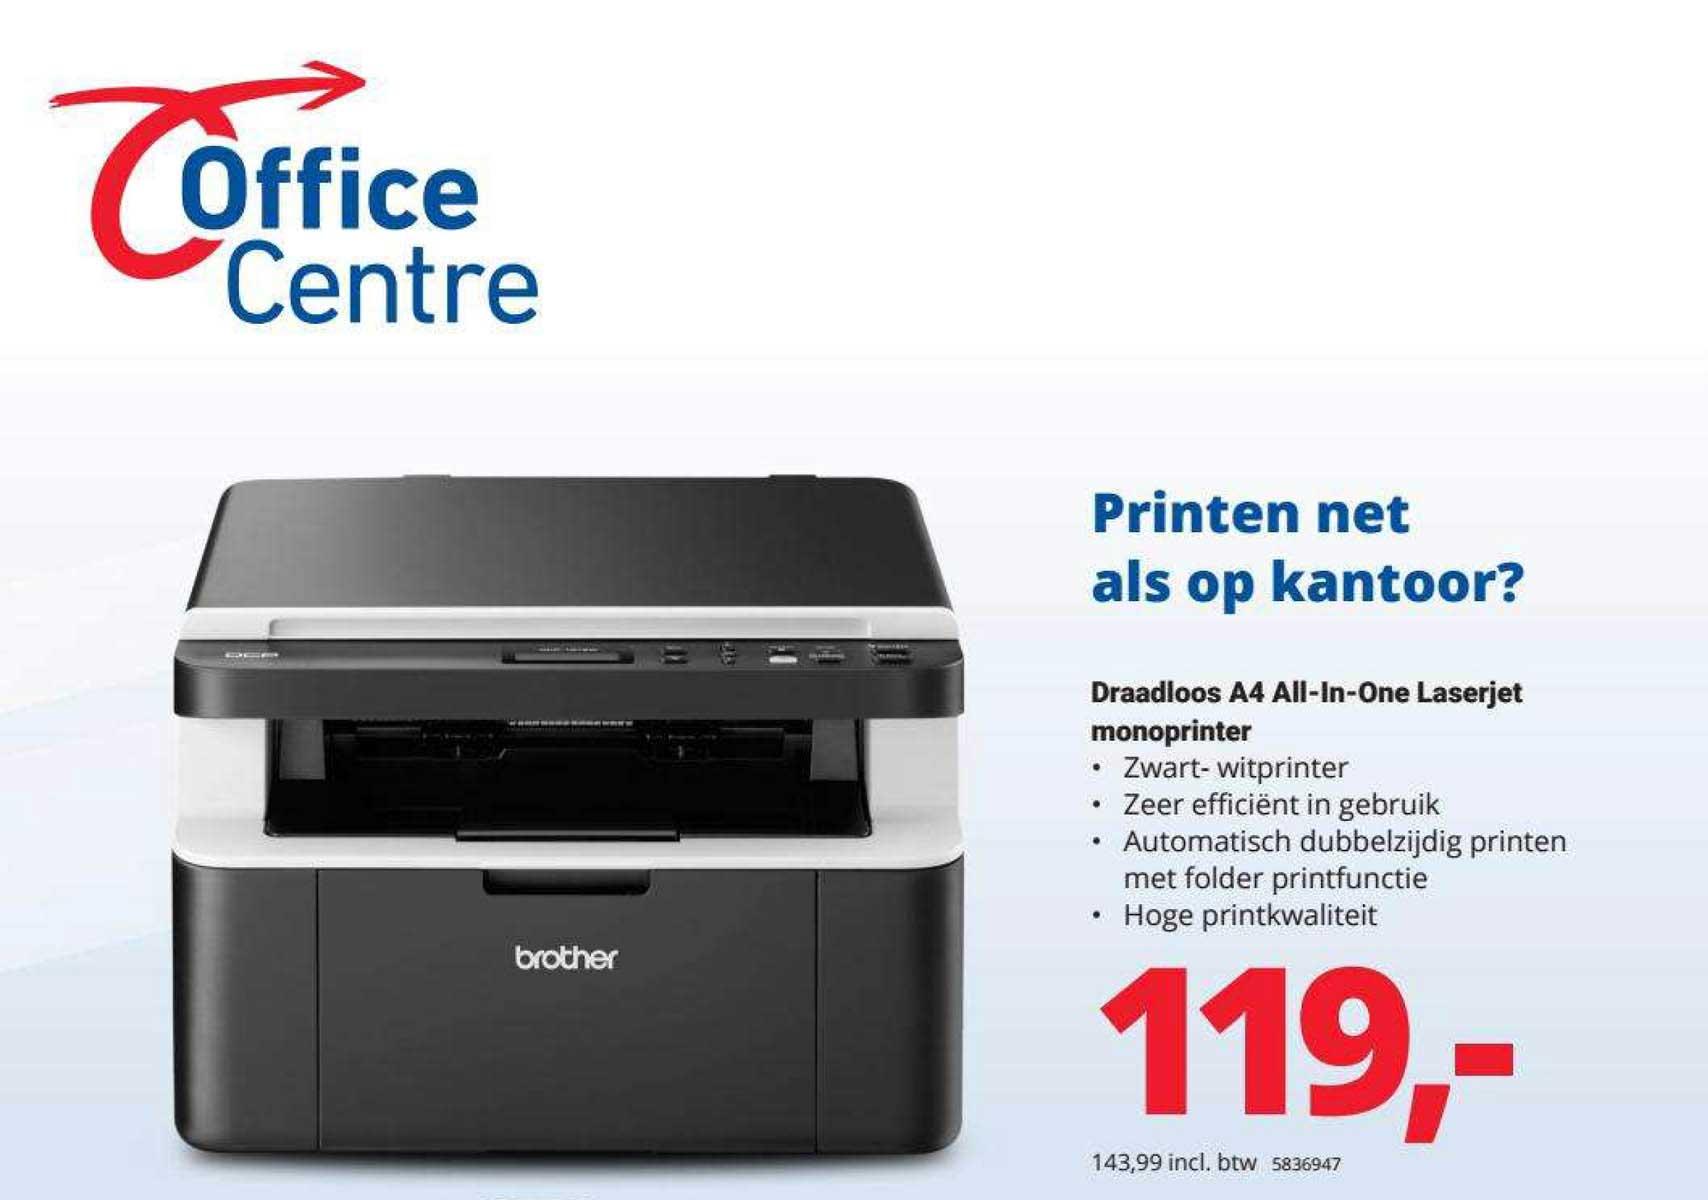 Office Centre Draadloos A4 All-in-One Laserjet Monoprinter